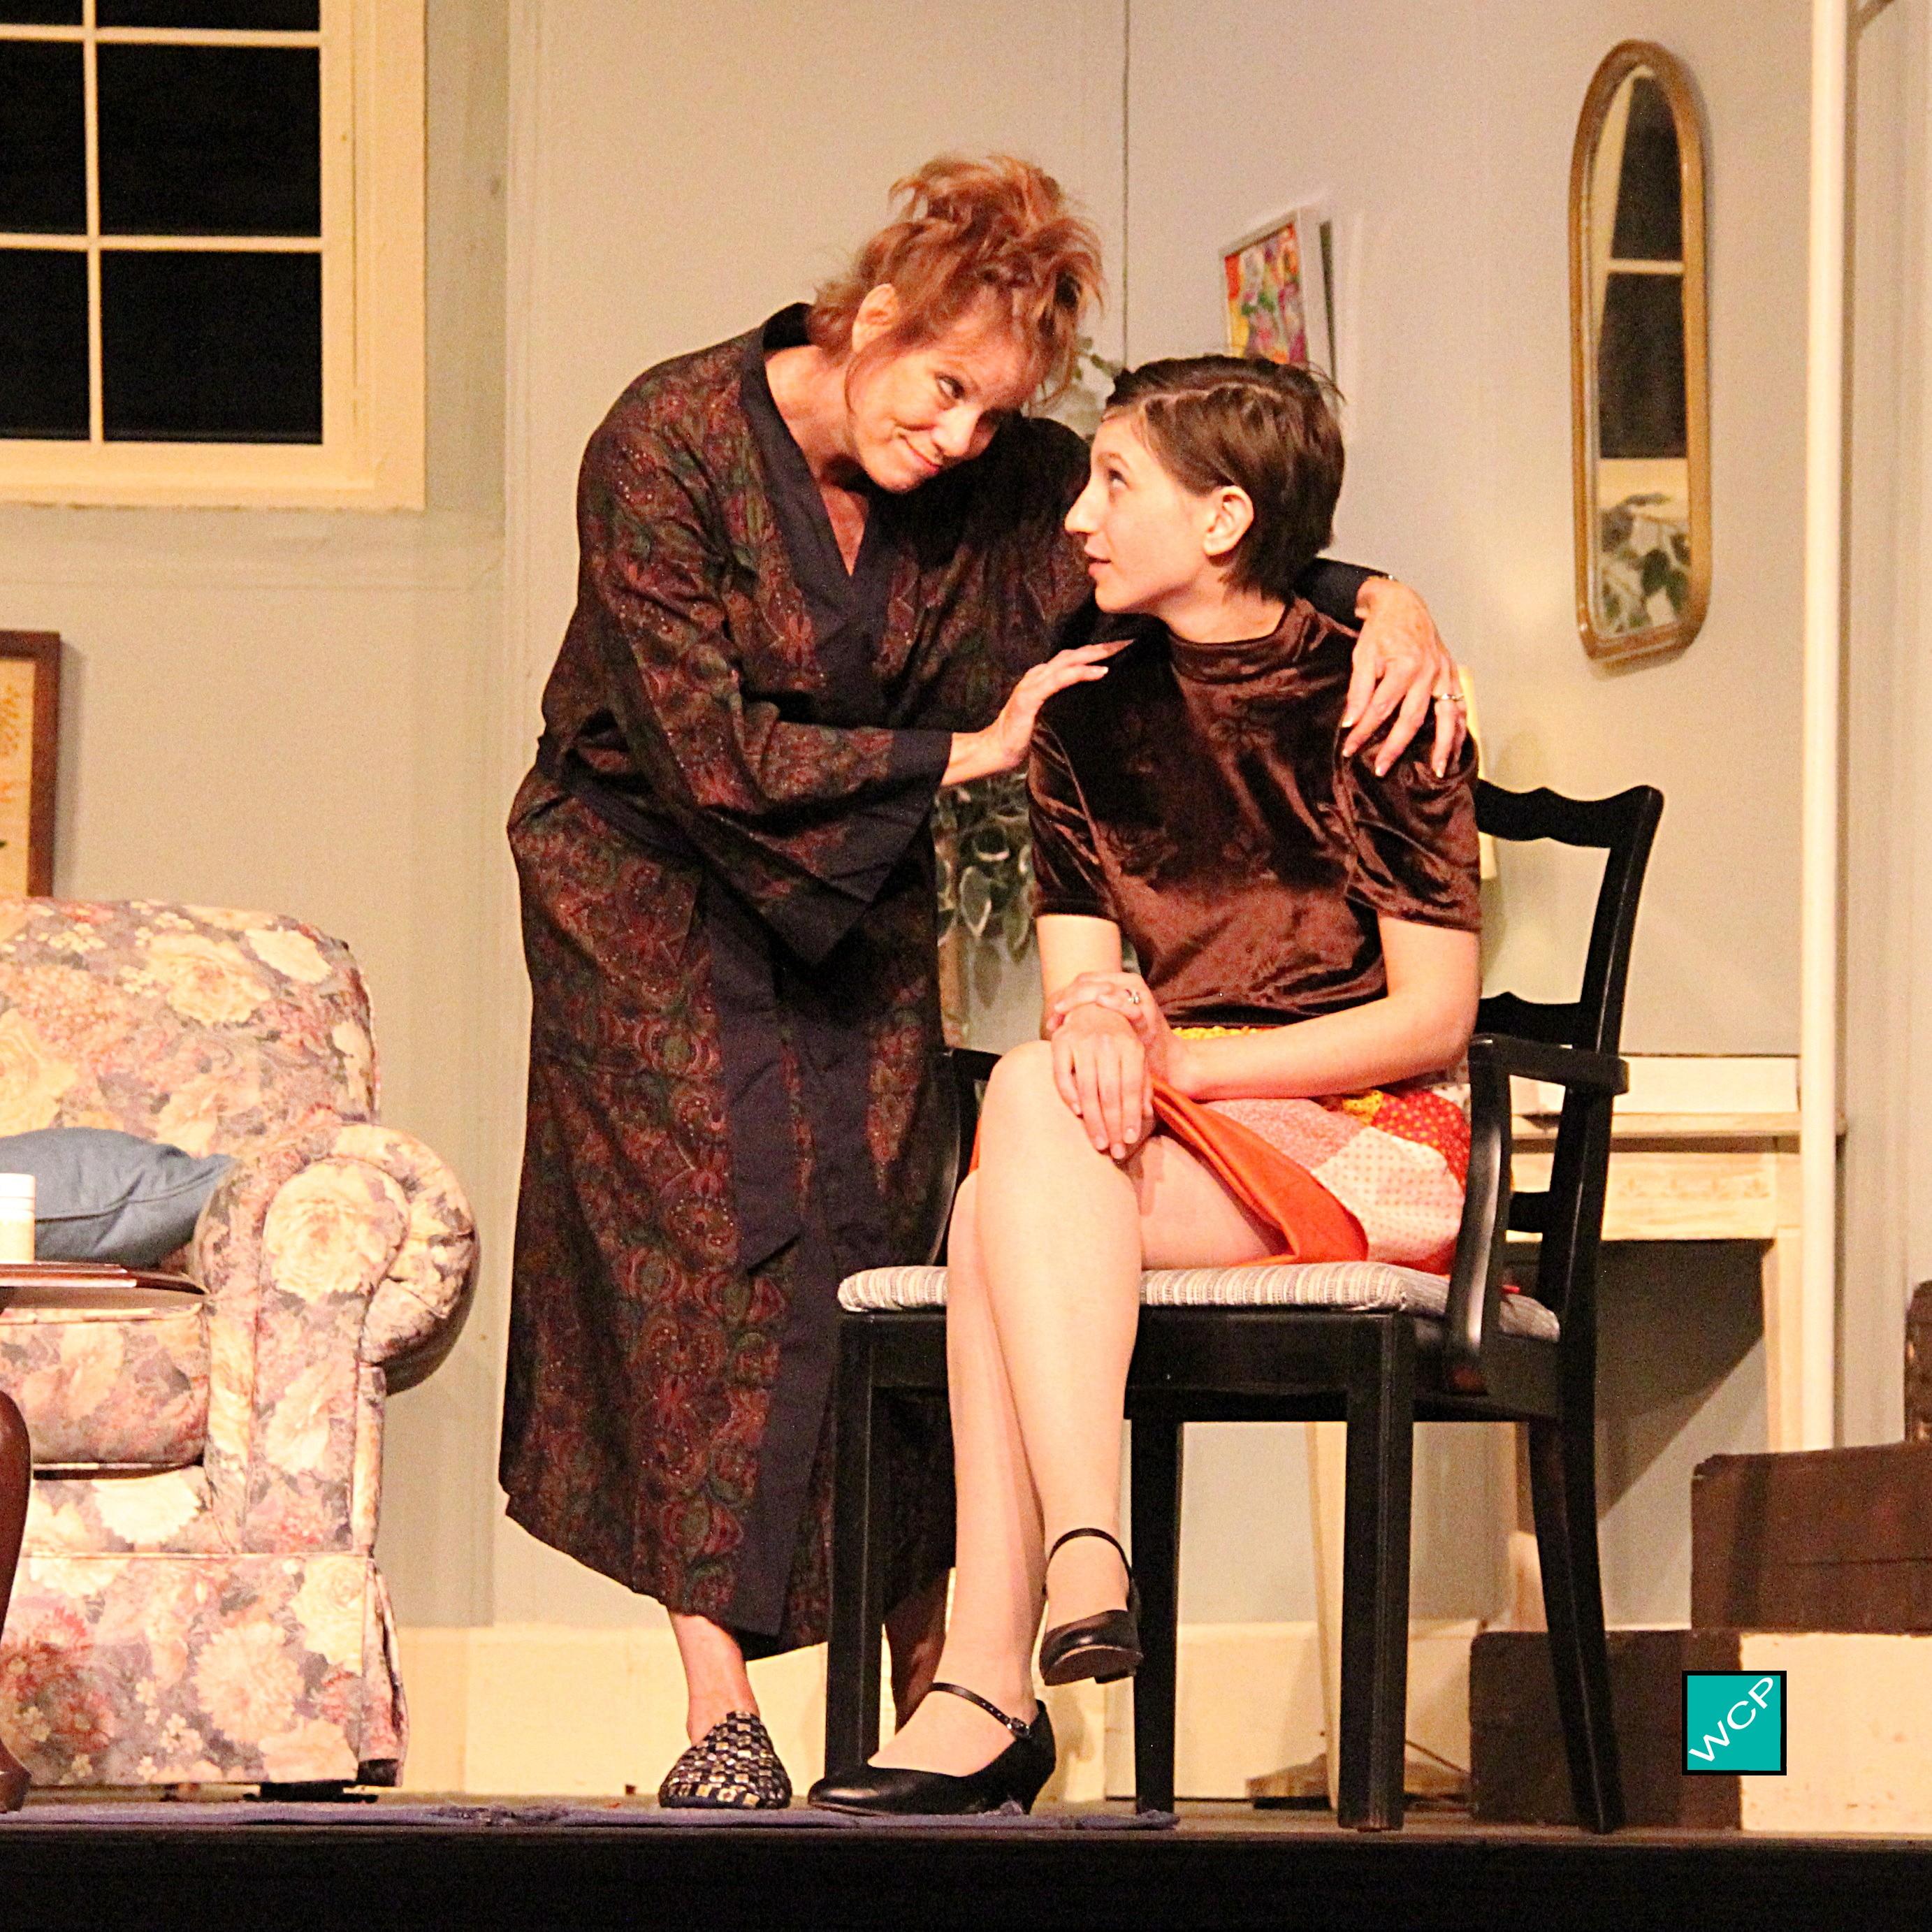 Zita Geoffroy-Heinz as Mrs. Banks, Debbie Campanali as Corie